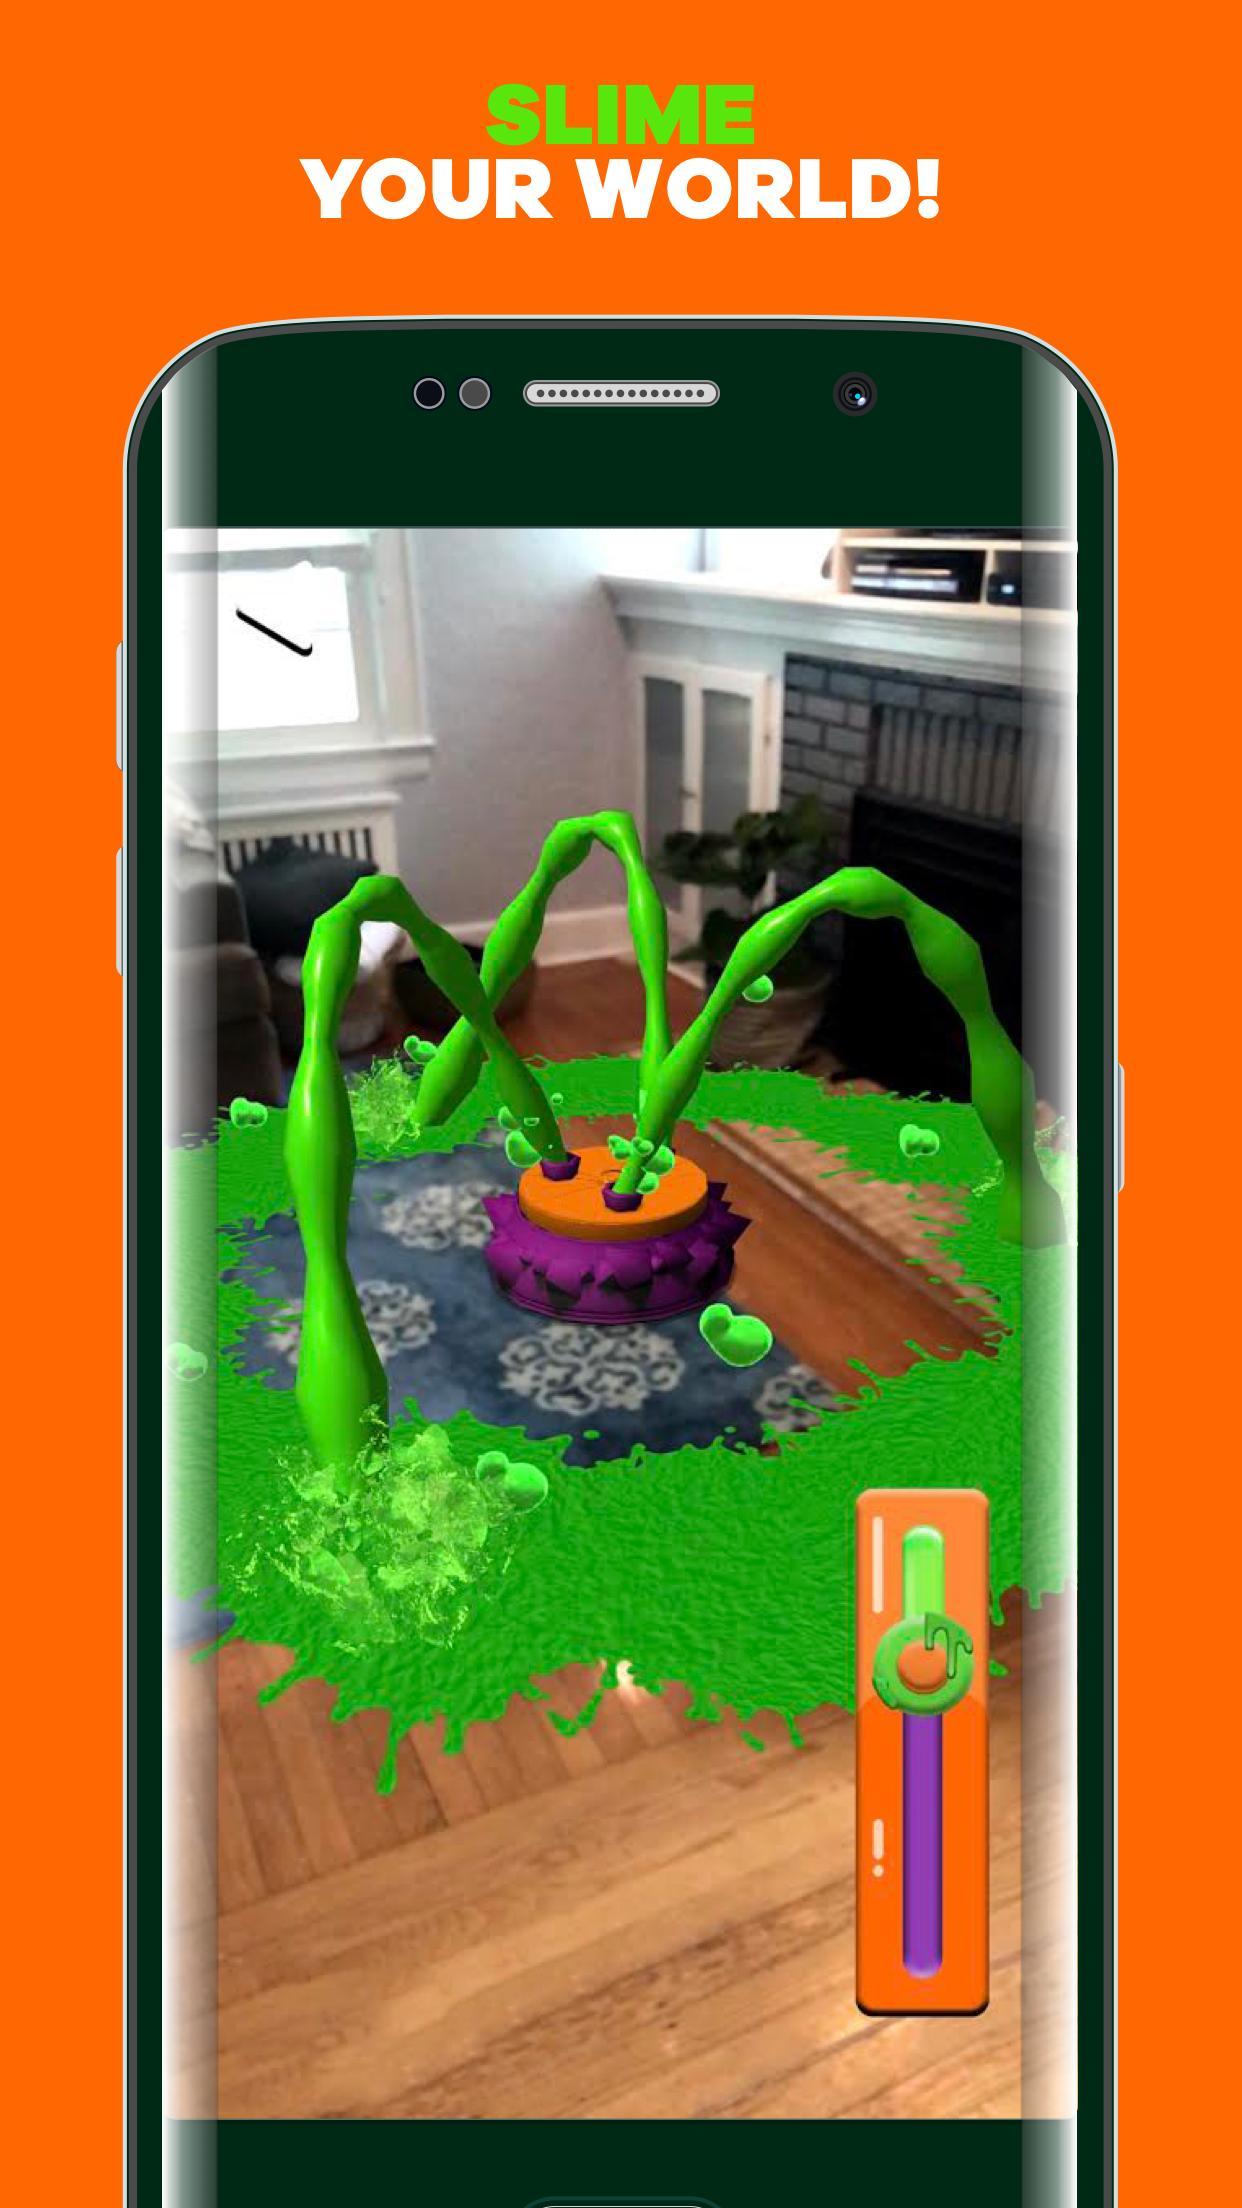 SCREENS UP by Nickelodeon 6.1.1763 Screenshot 5